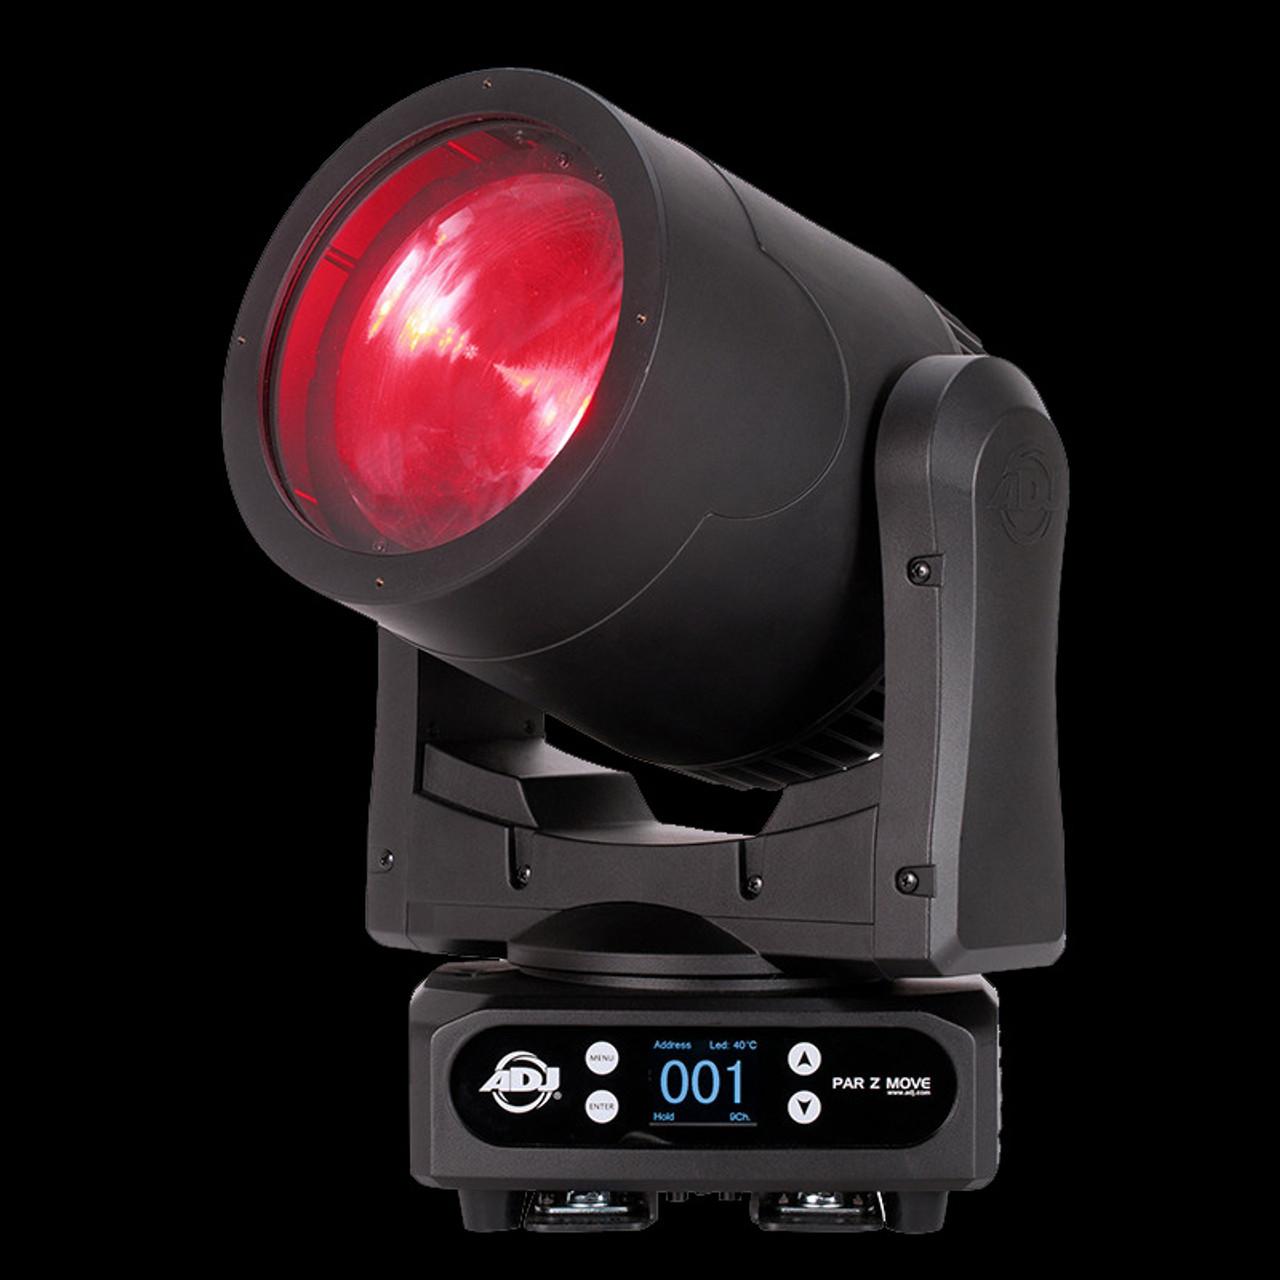 ADJ Par Z Move RGBW LED Beam / Wash Moving Head Light